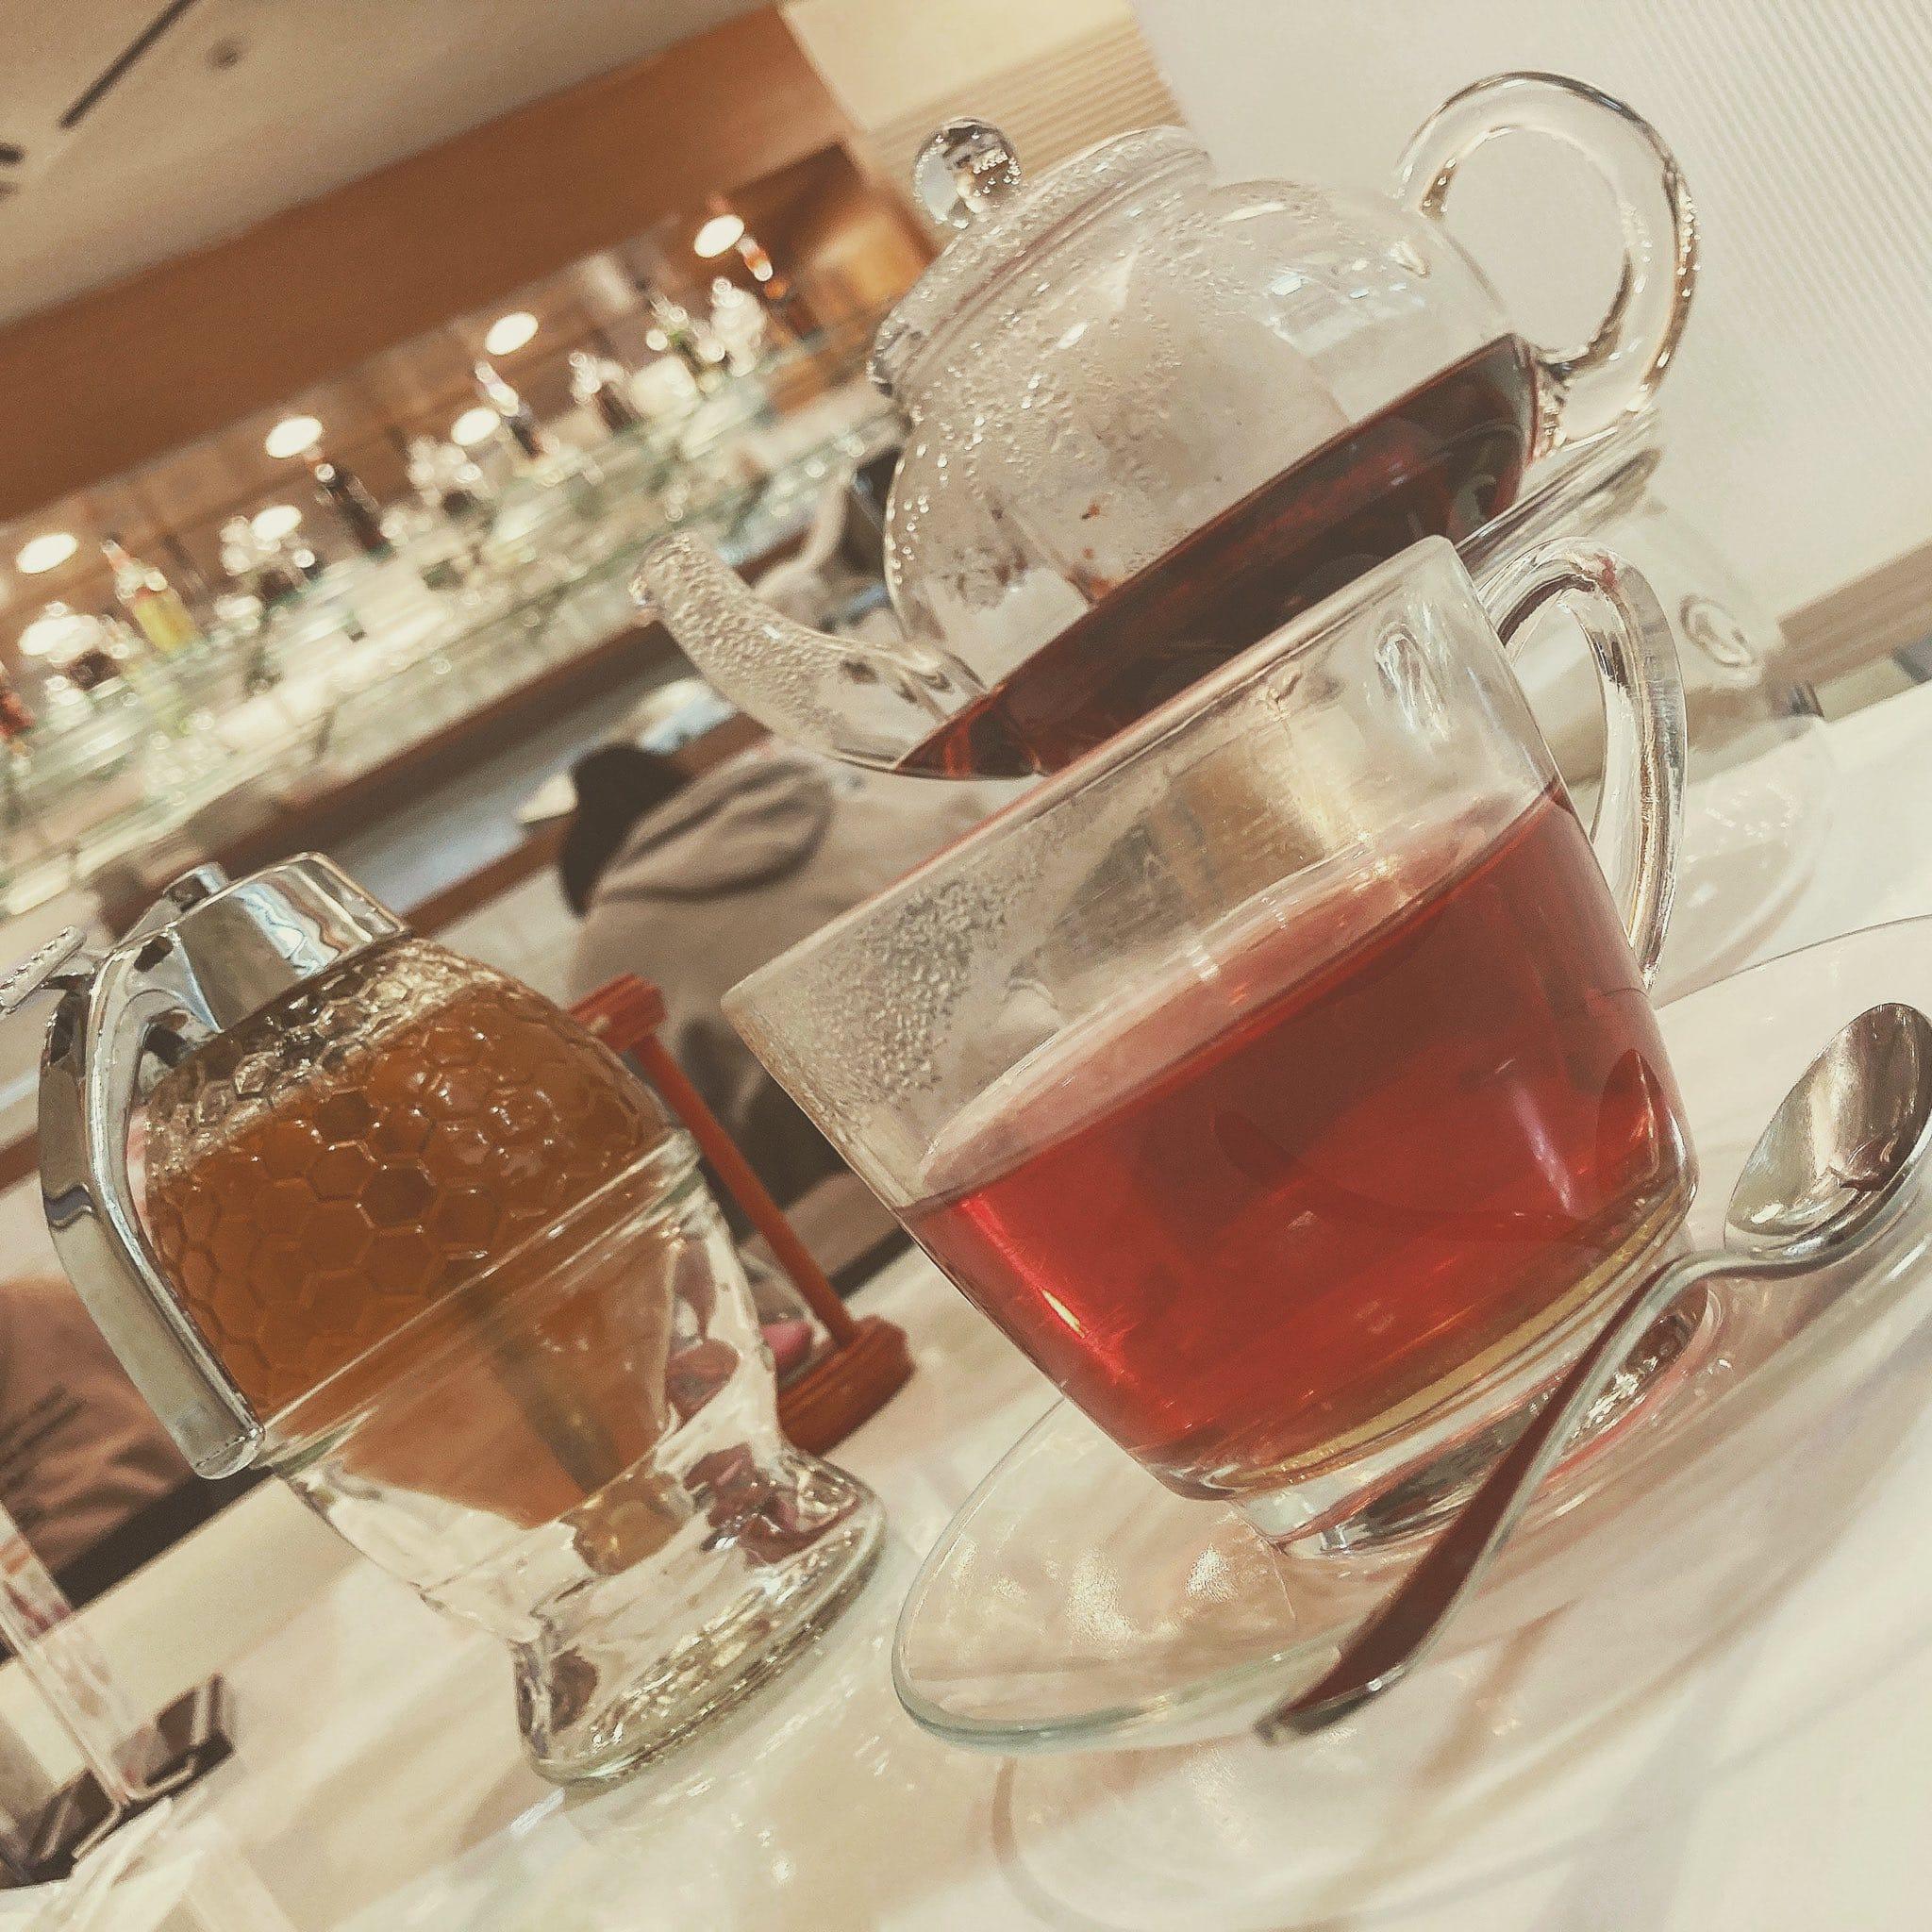 「Tea time***」02/26(02/26) 13:36 | 小鳥遊 ゆまの写メ・風俗動画